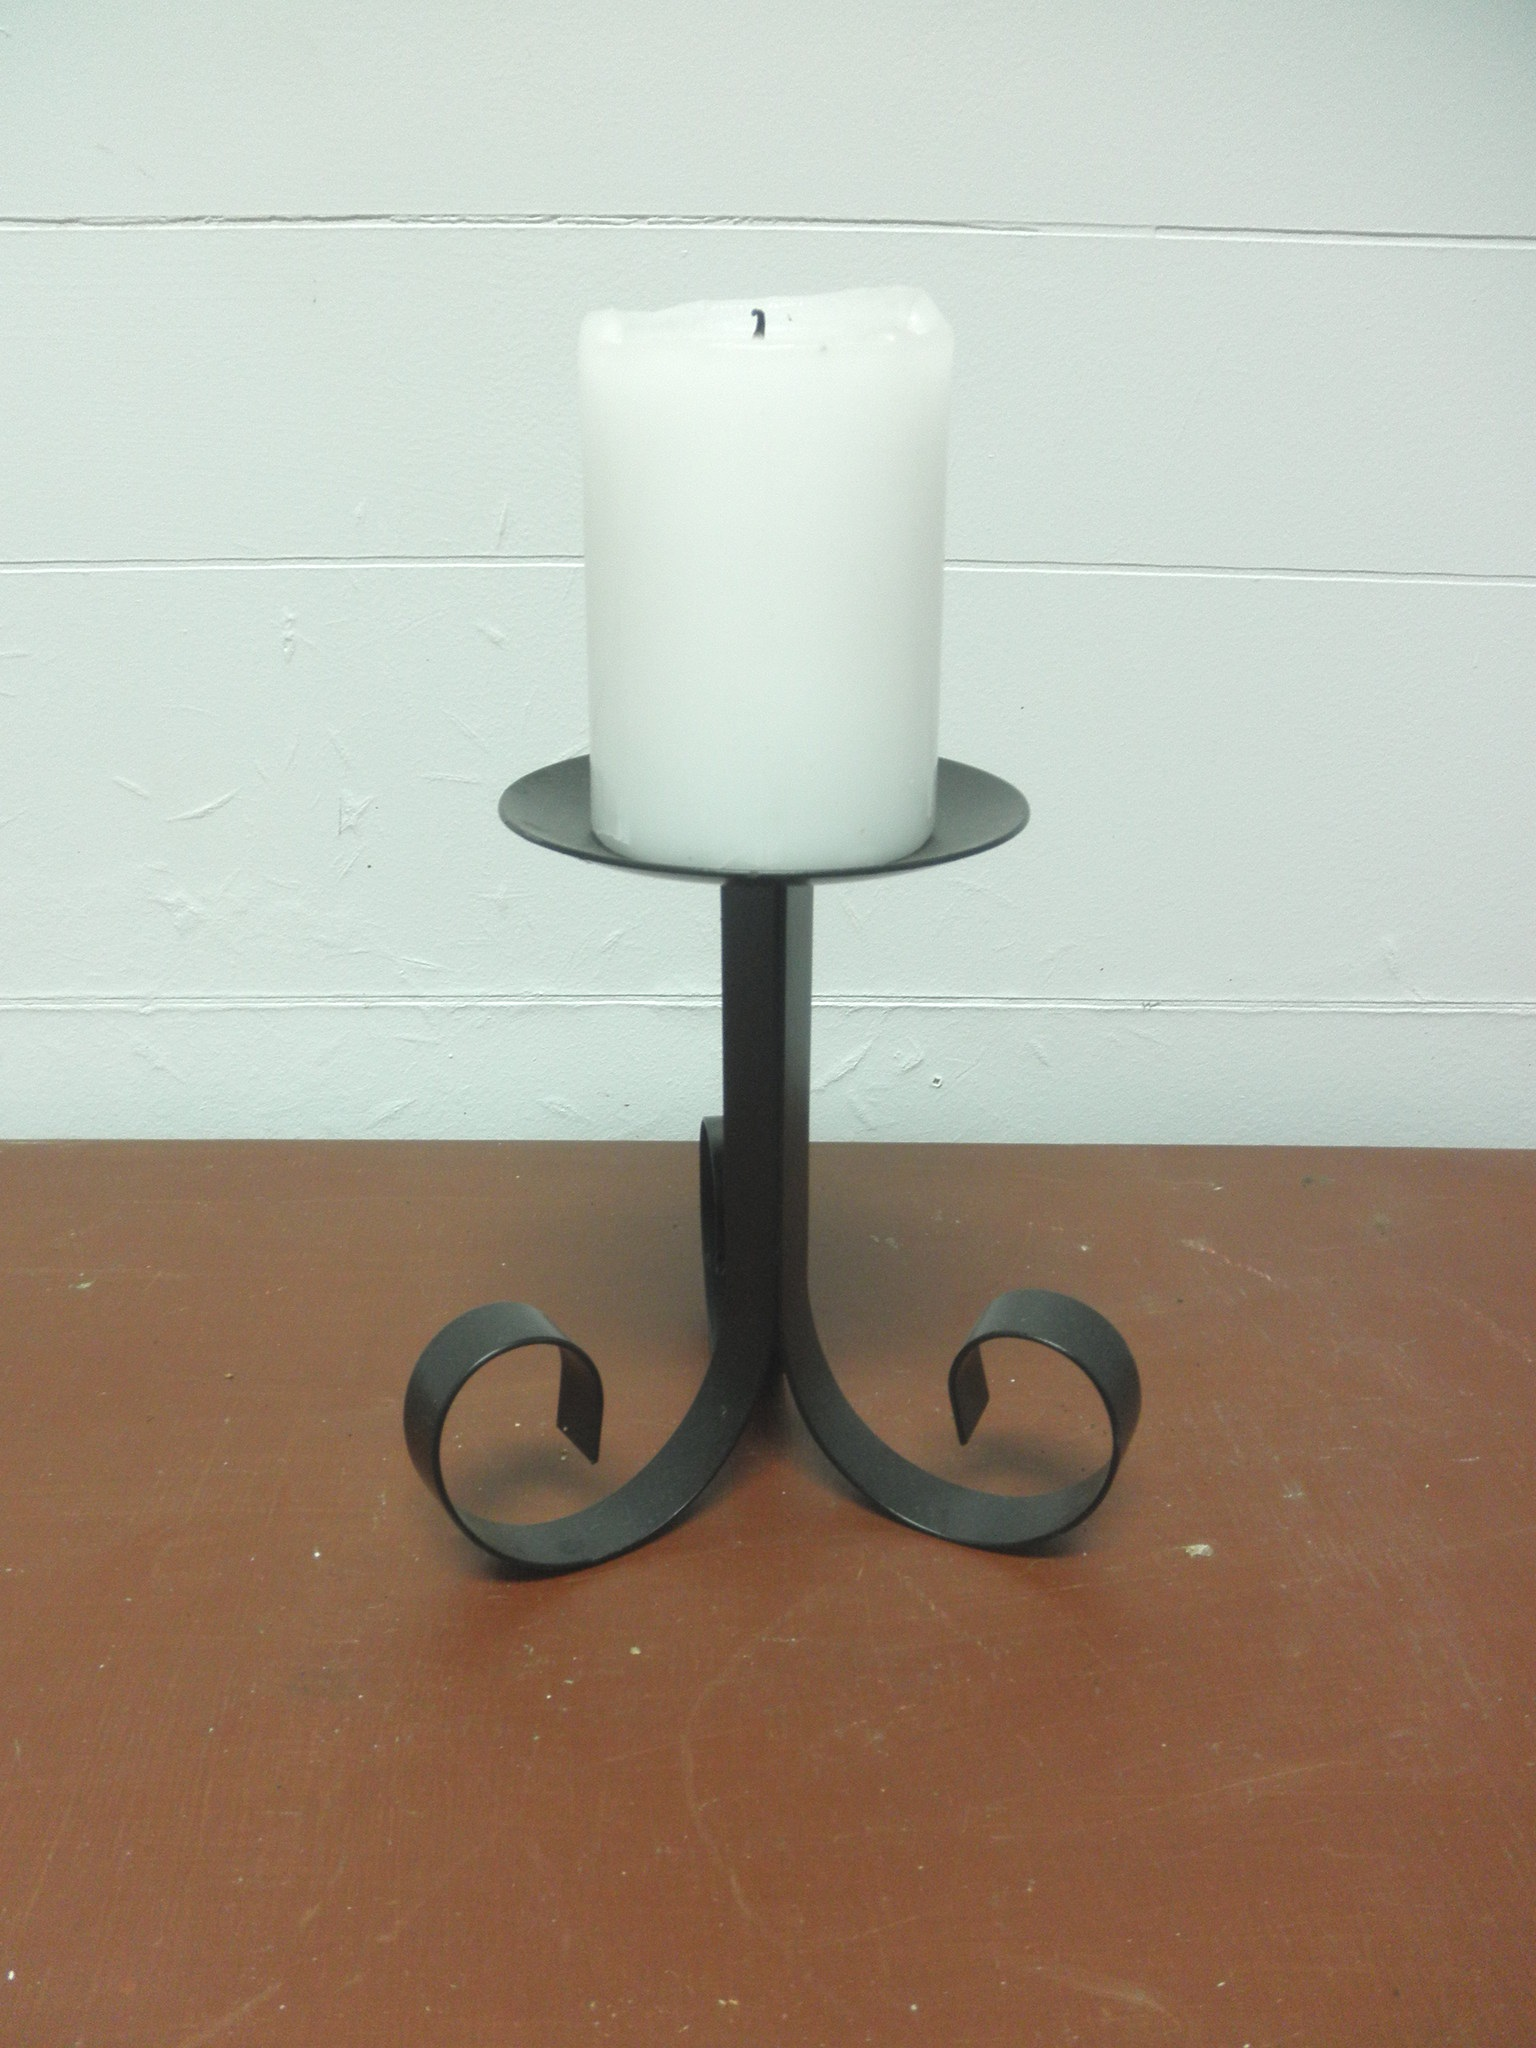 Wrought-iron-candle-holder_Easy-Resize.com.jpg